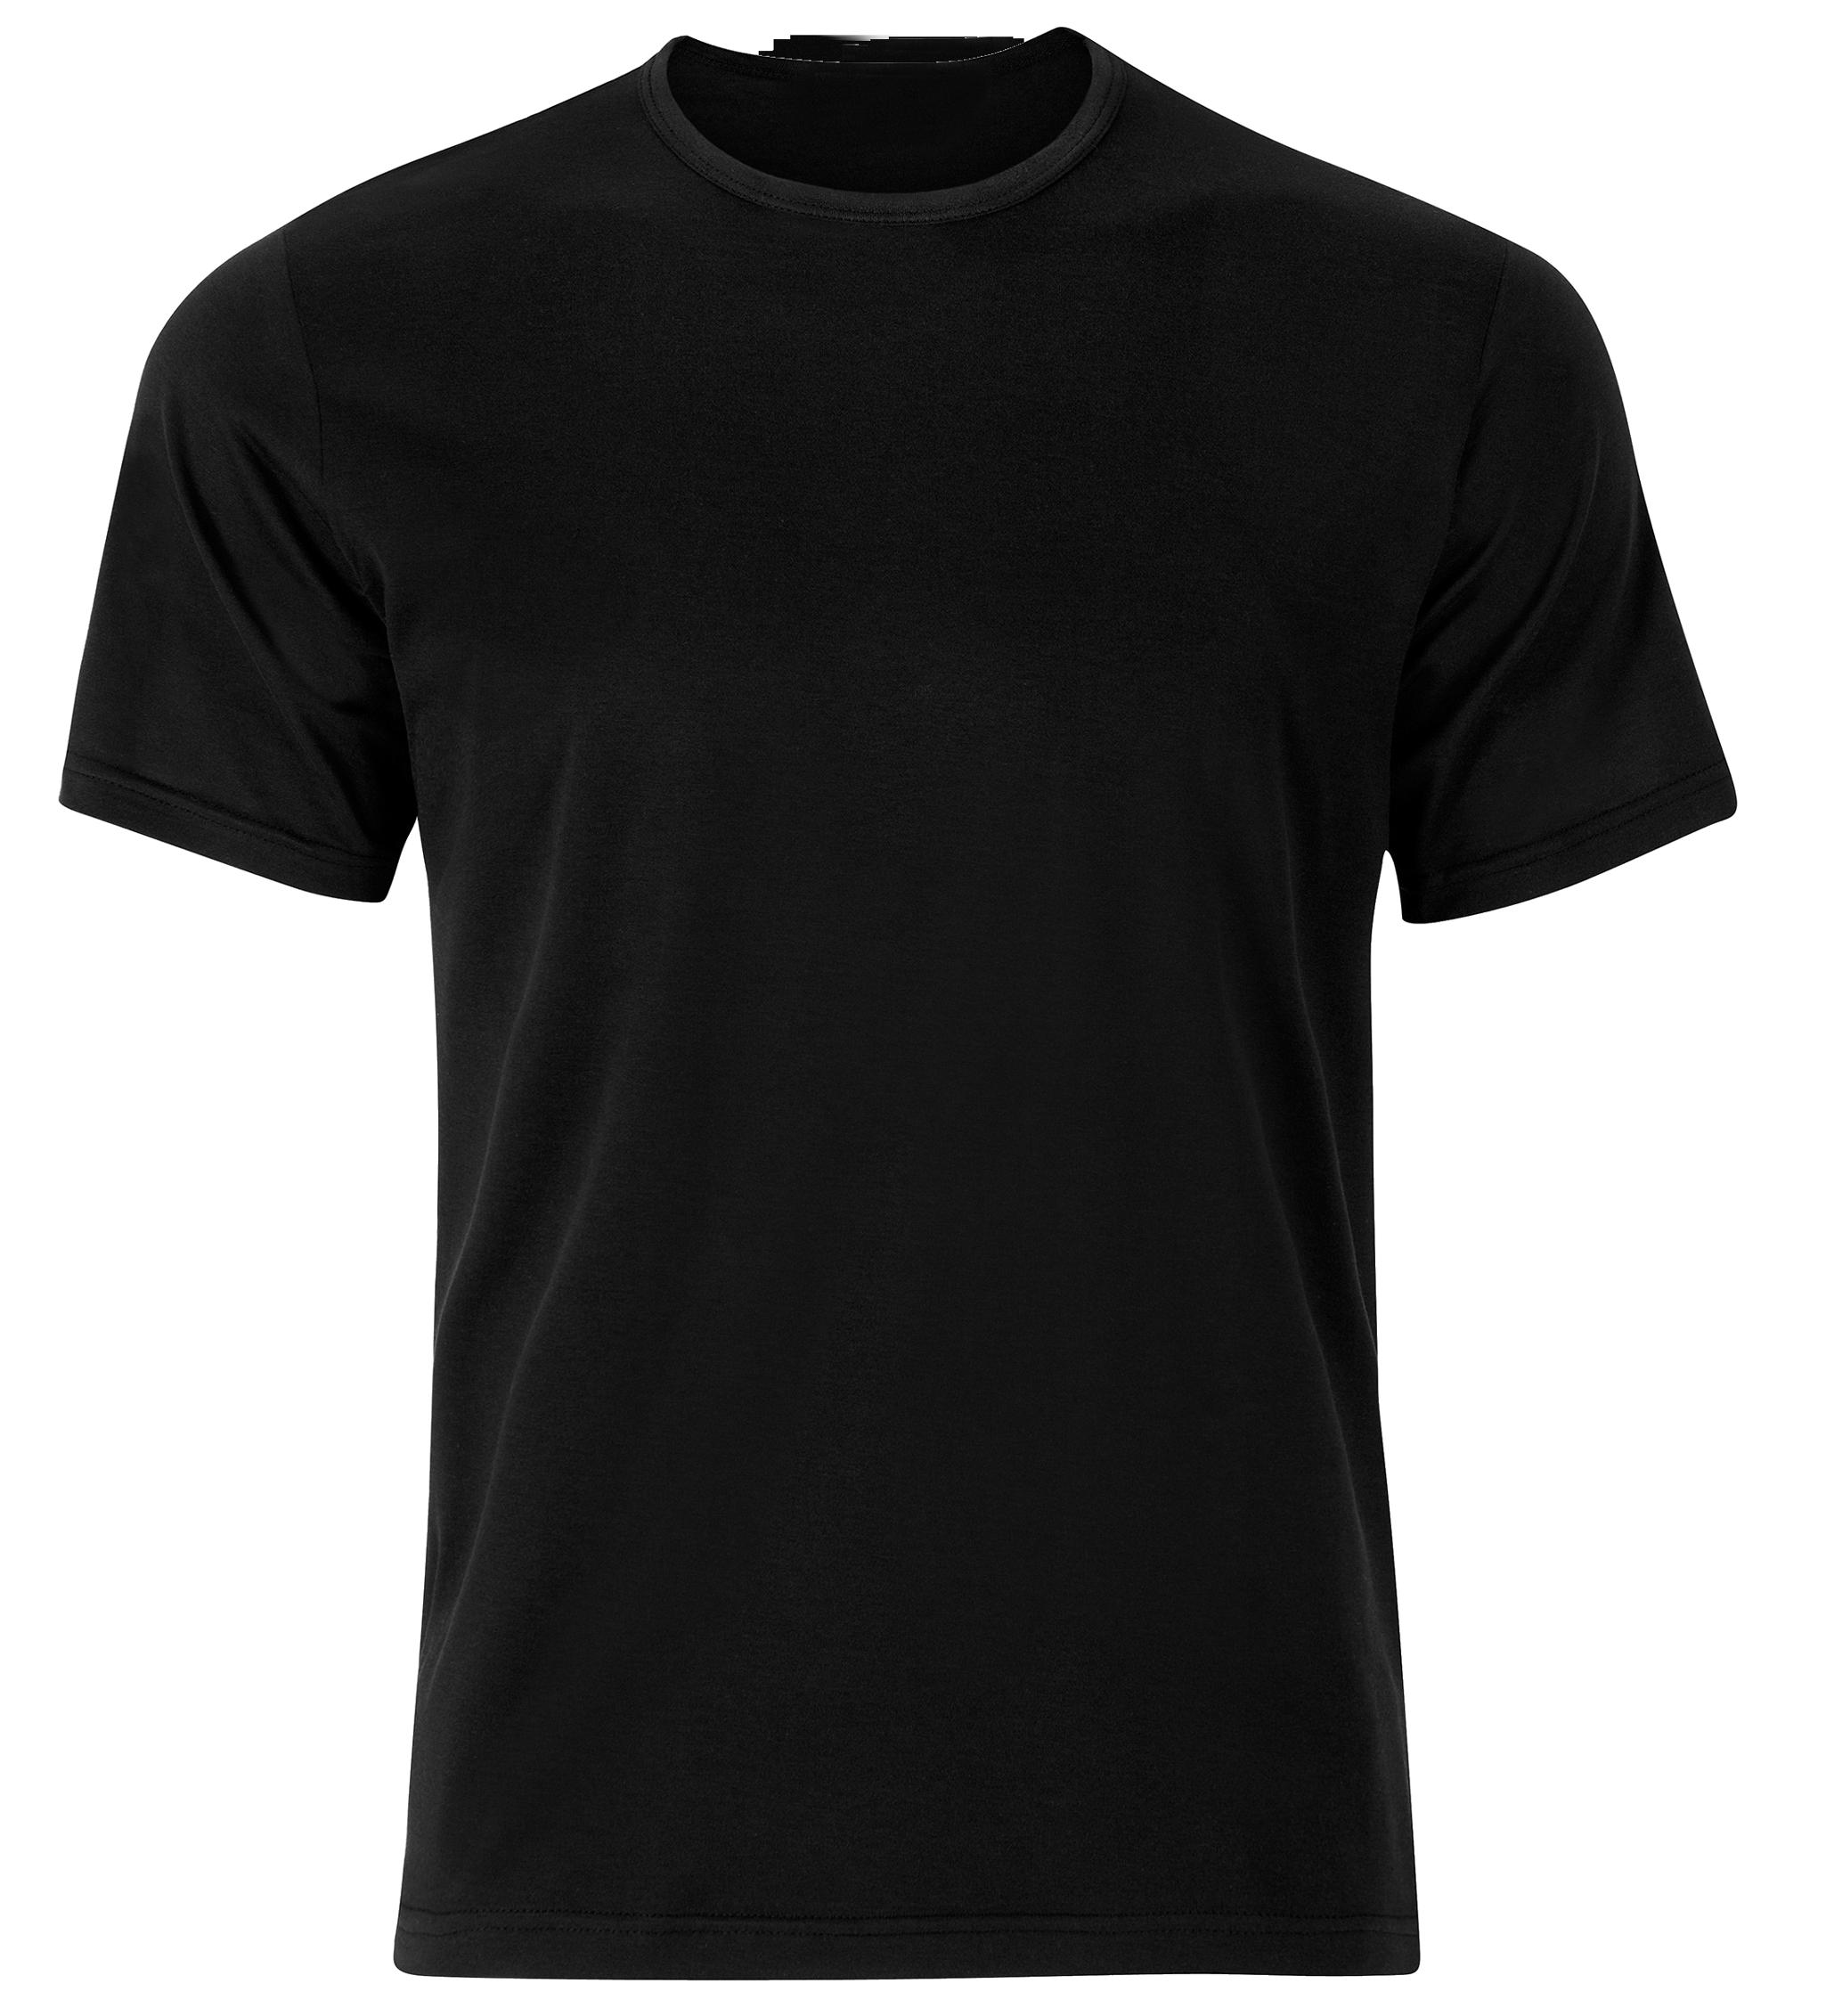 Black T Shirt PNG Transparent